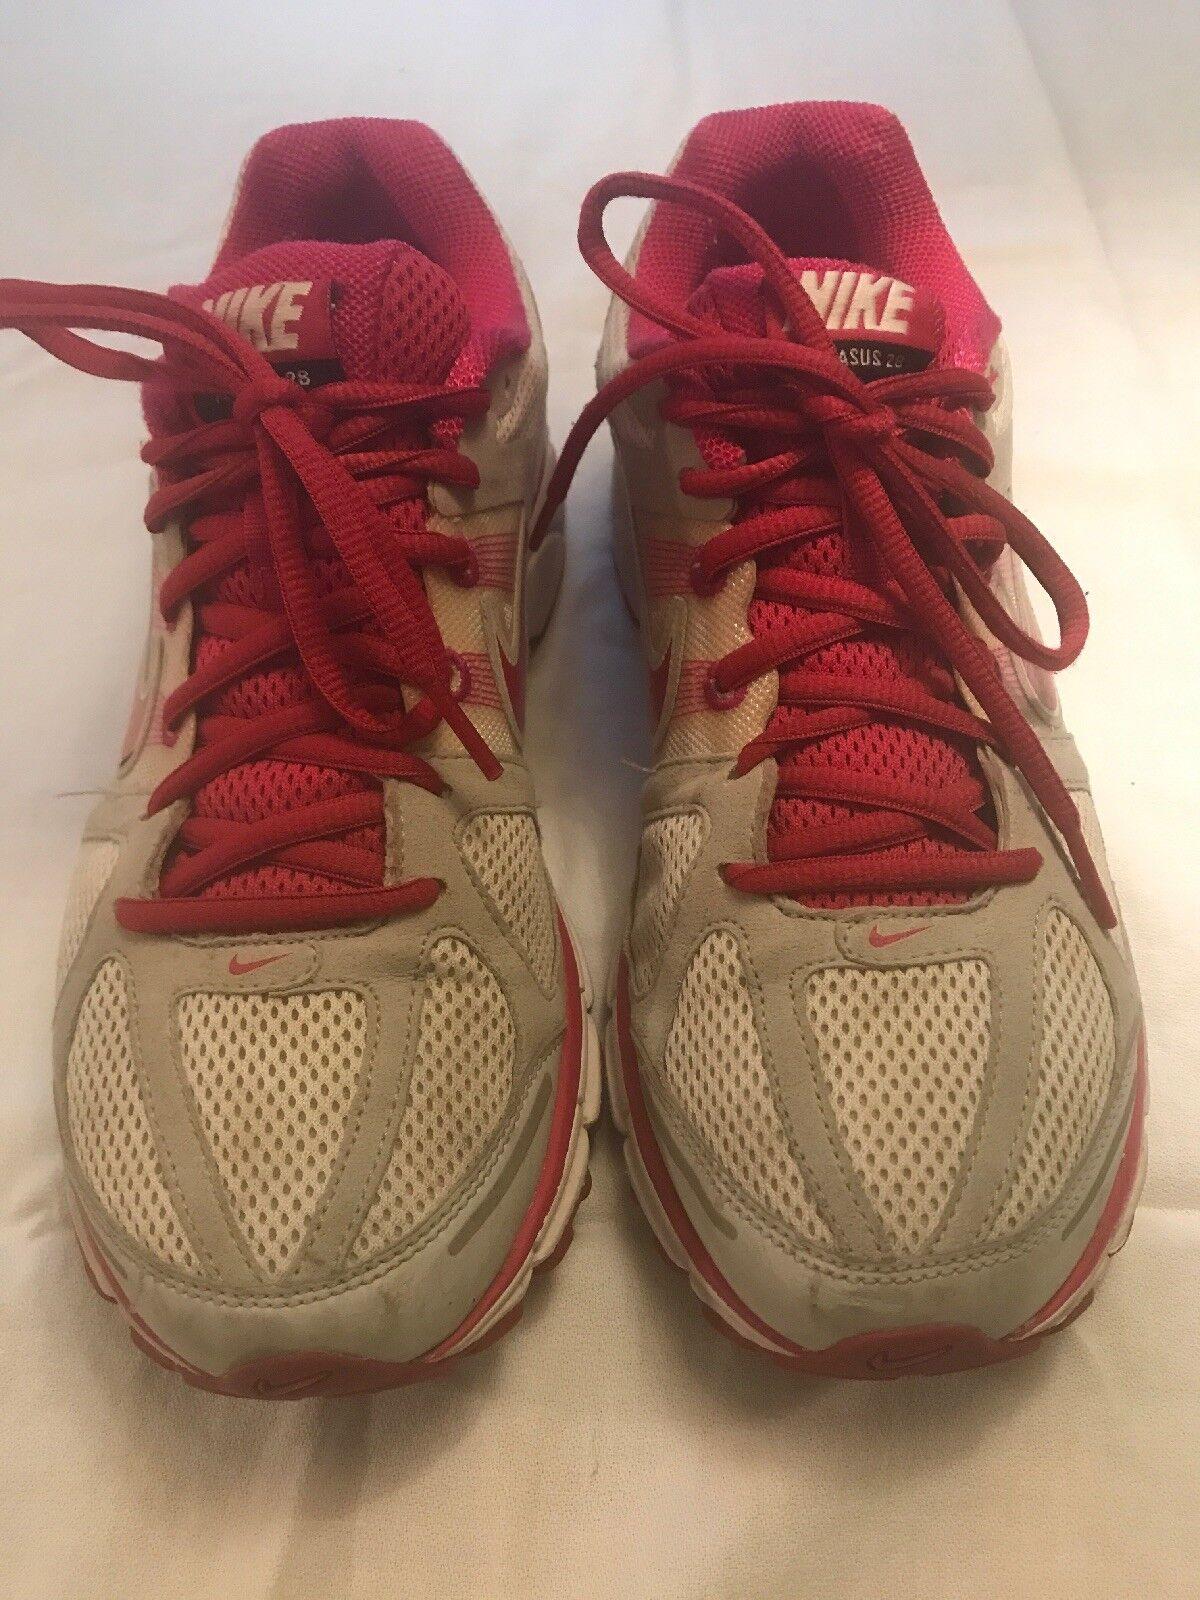 NIKE Pegasus 28 C Women's Sneaker Size 9.5